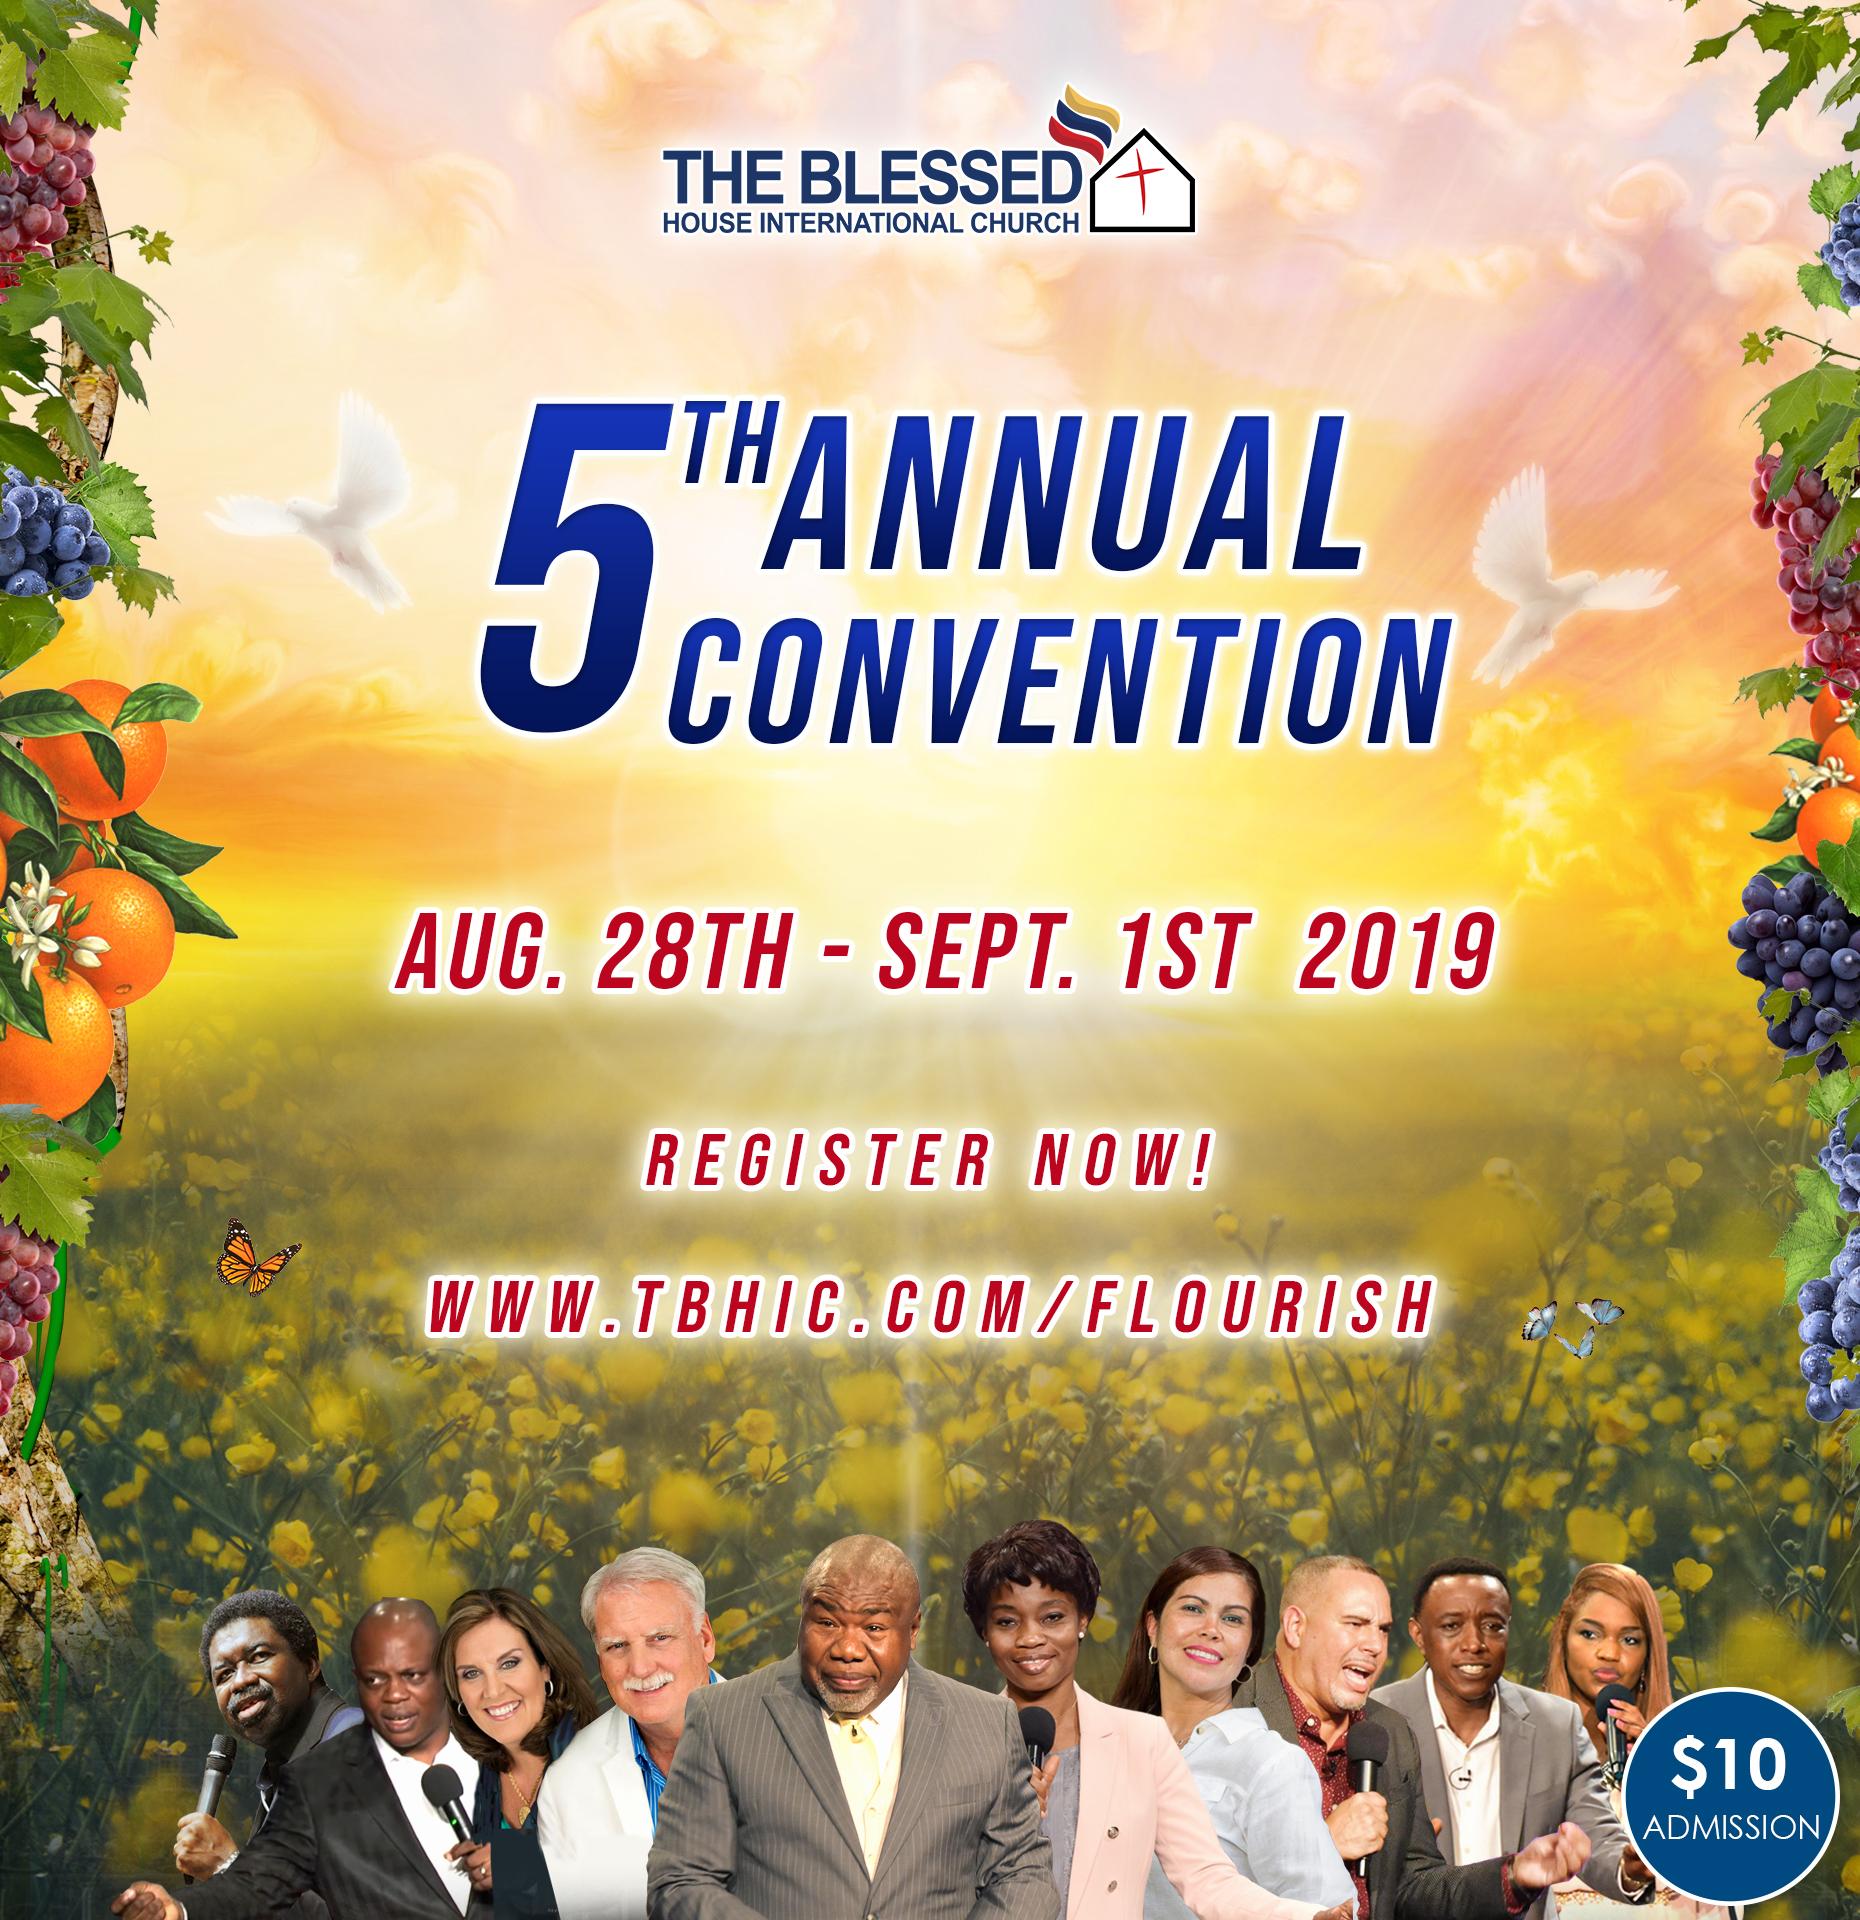 5th Annual Convention 2019